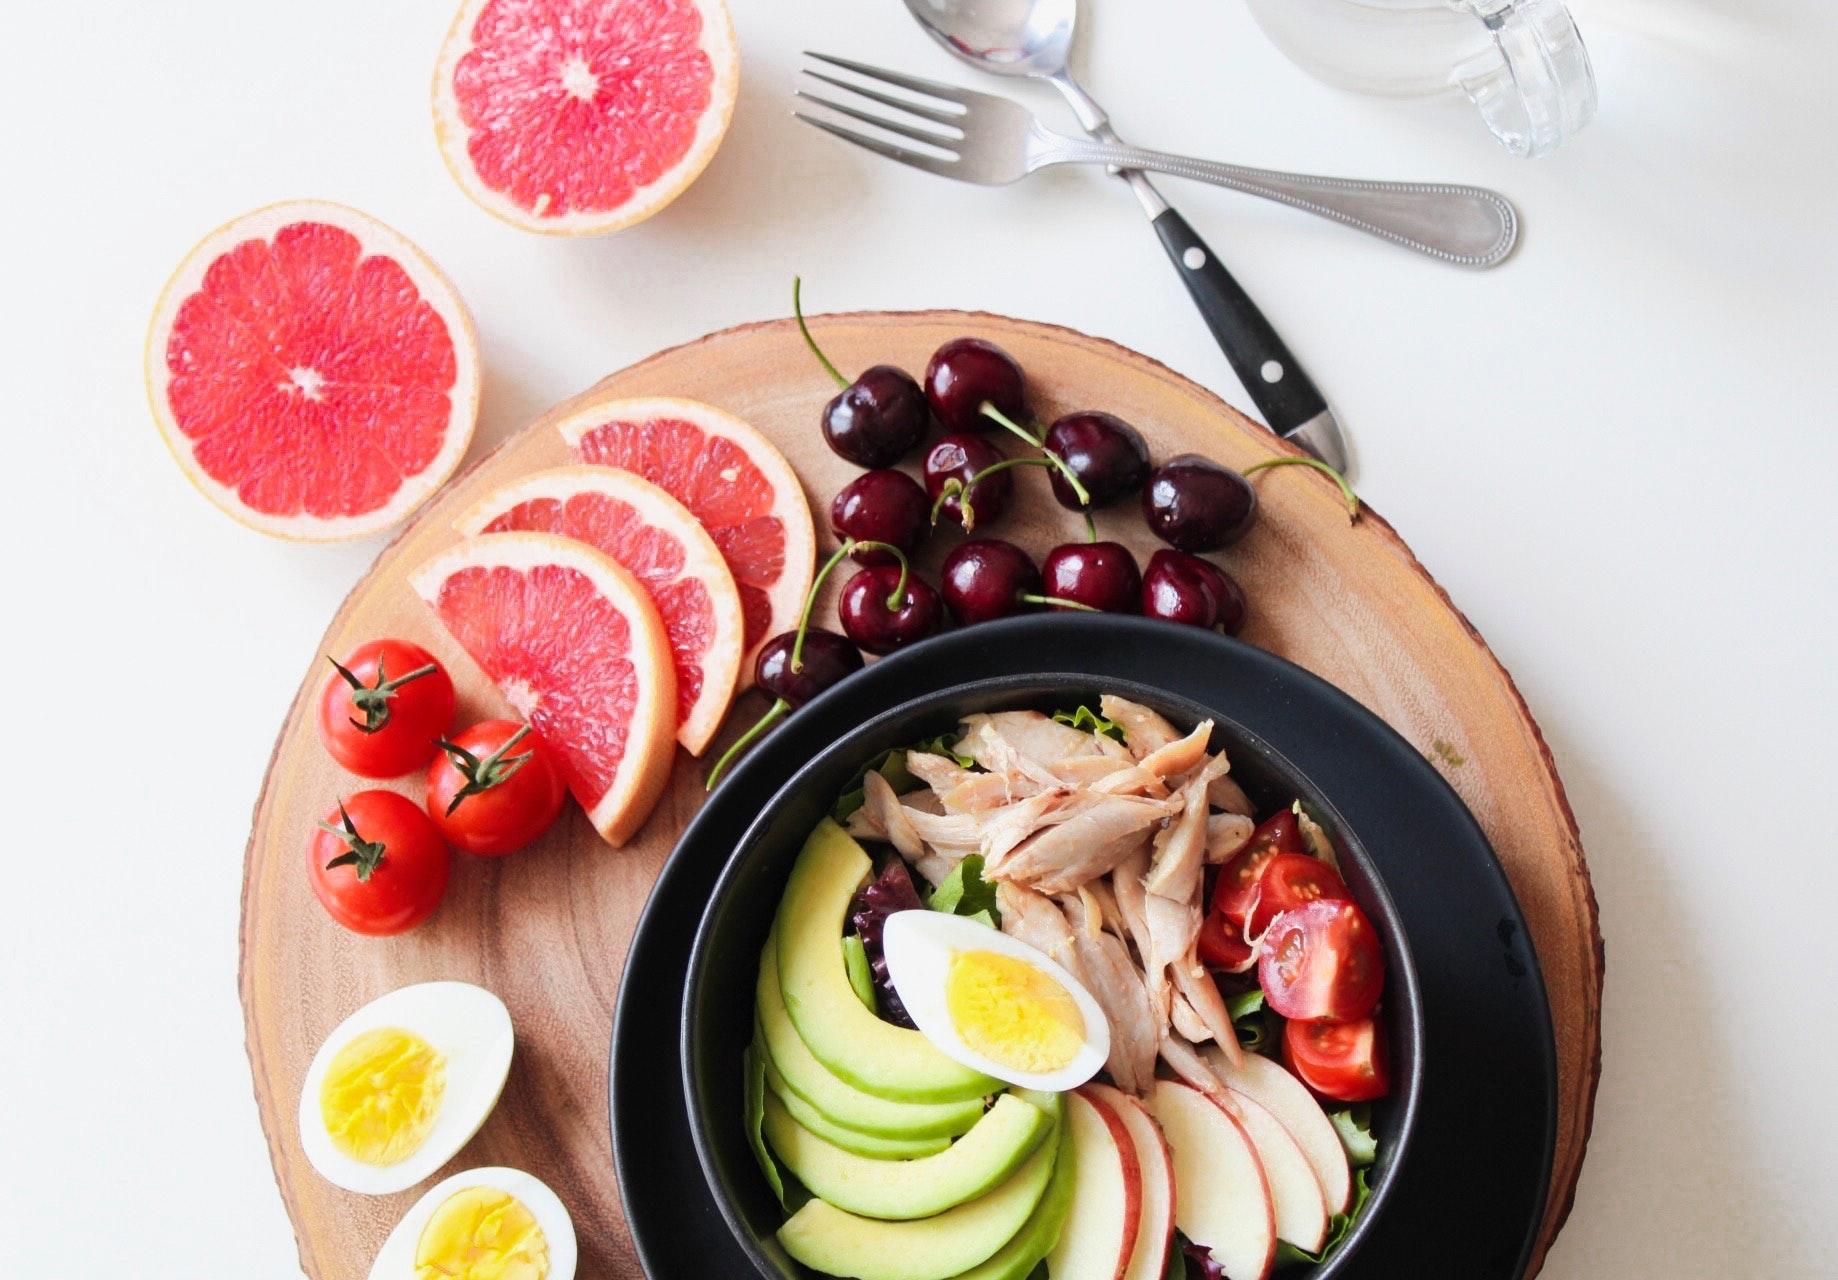 Module #2: Food, Fat Adaptation & Regulating Hormones -